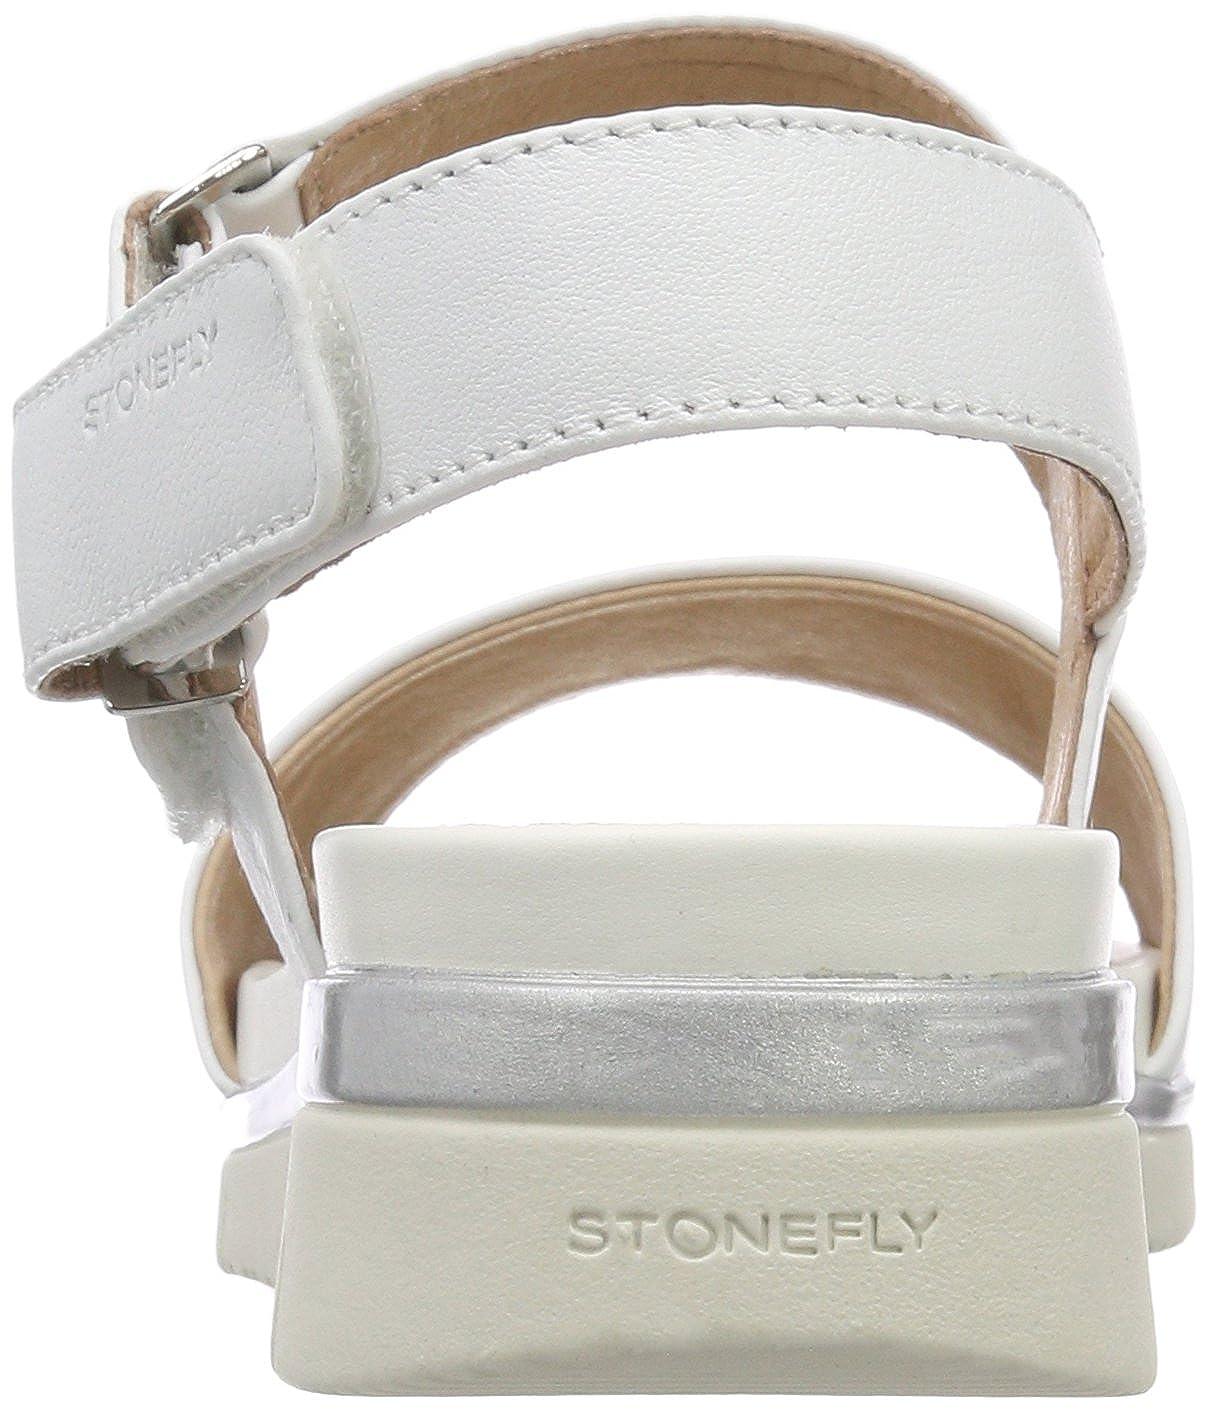 Stonefly Elody Elody Elody 5 Nappa, Sandali con Cinturino alla Caviglia Donna  Avorio (Cloud White 150) d25018